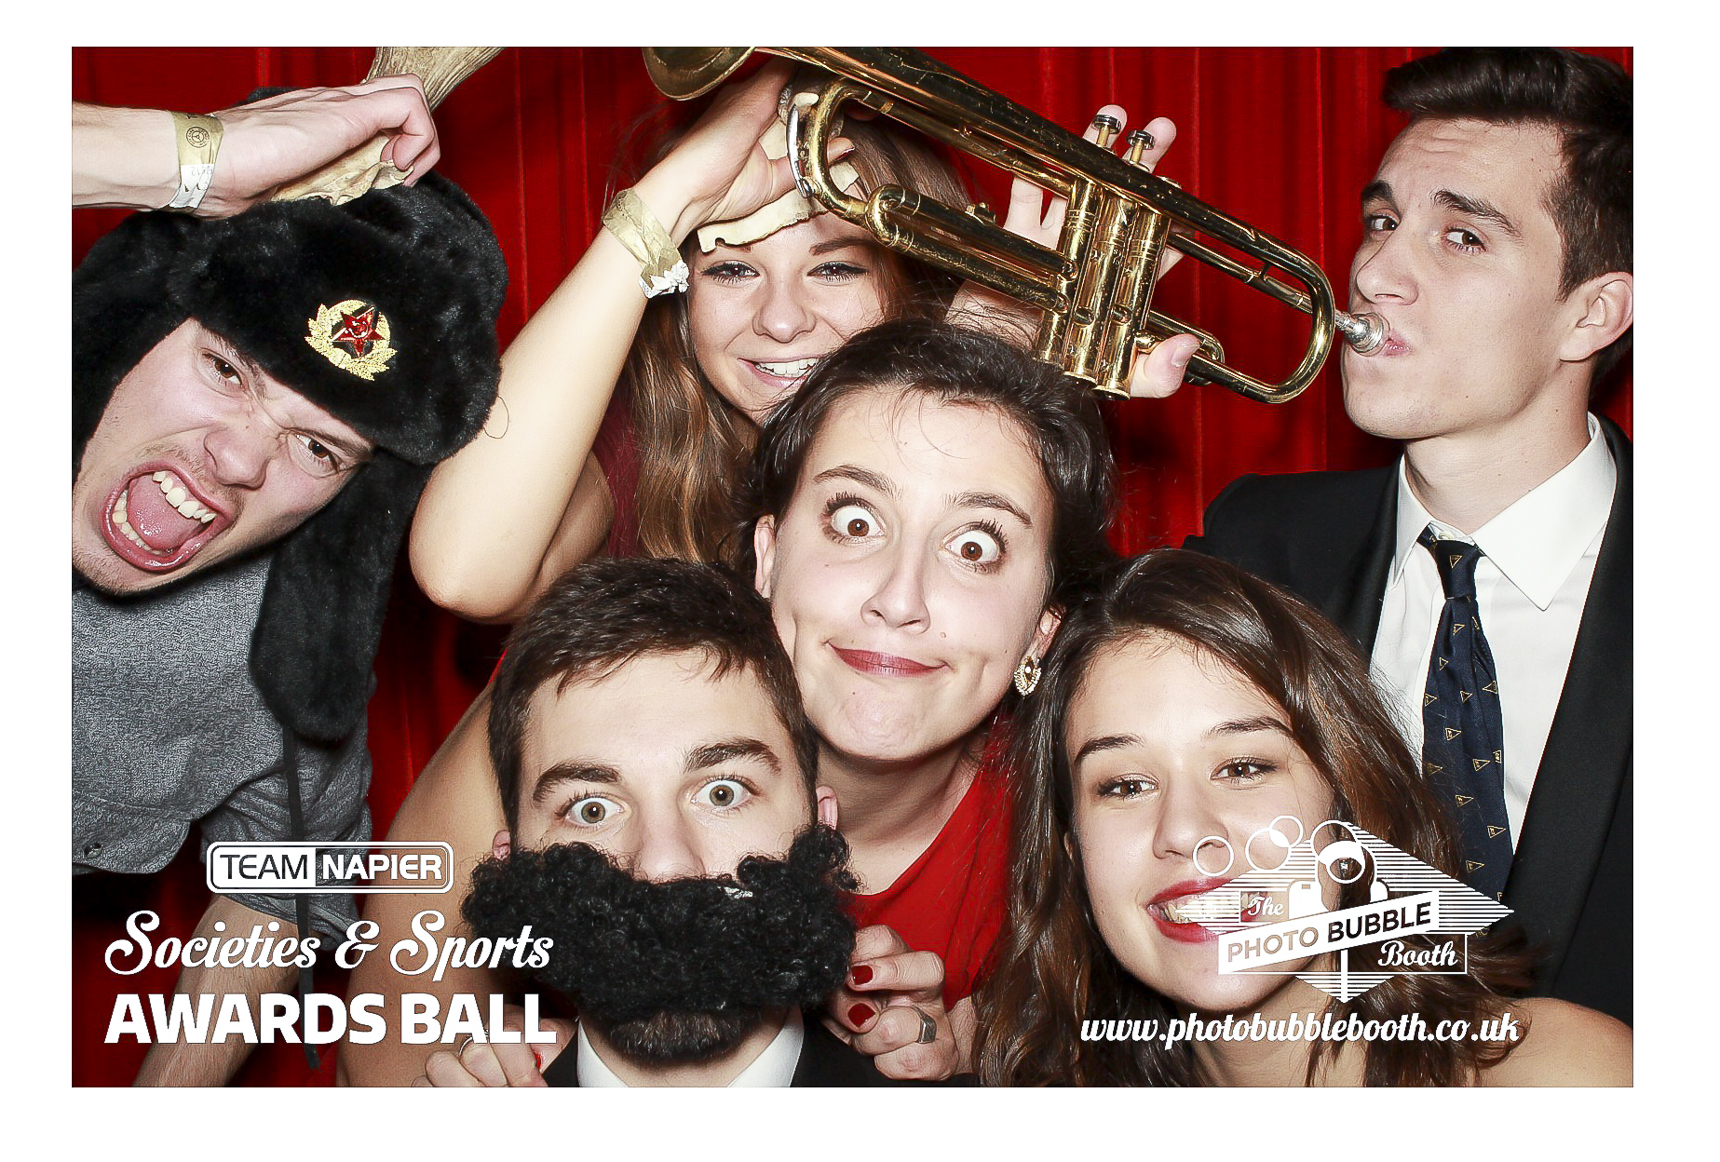 Napier Societies & Sports Awards_68.JPG